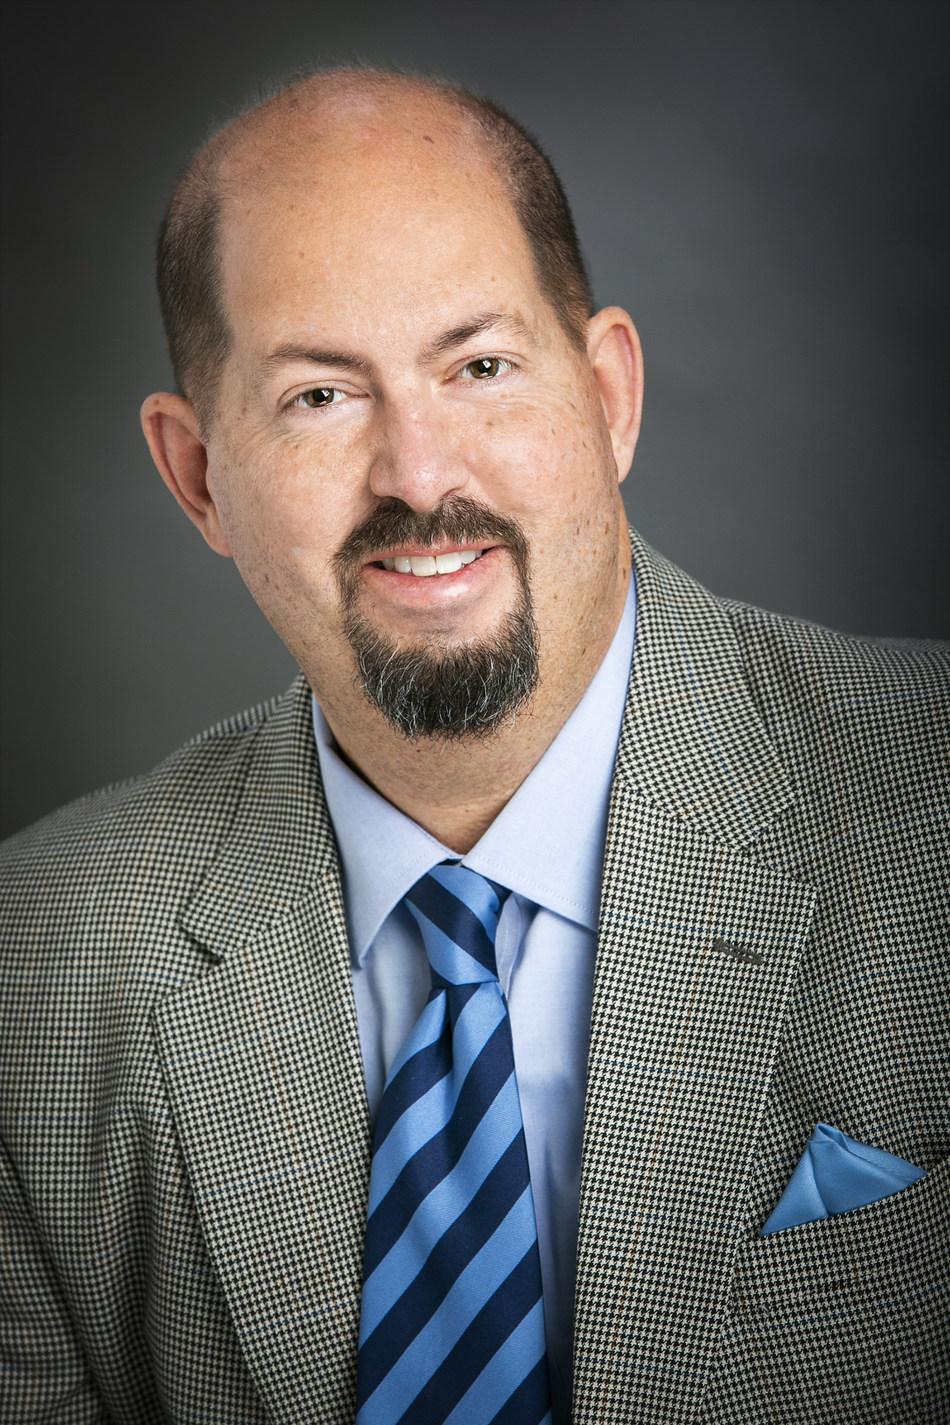 Rick Copeland, Senior Vice President, M&A Executive Search